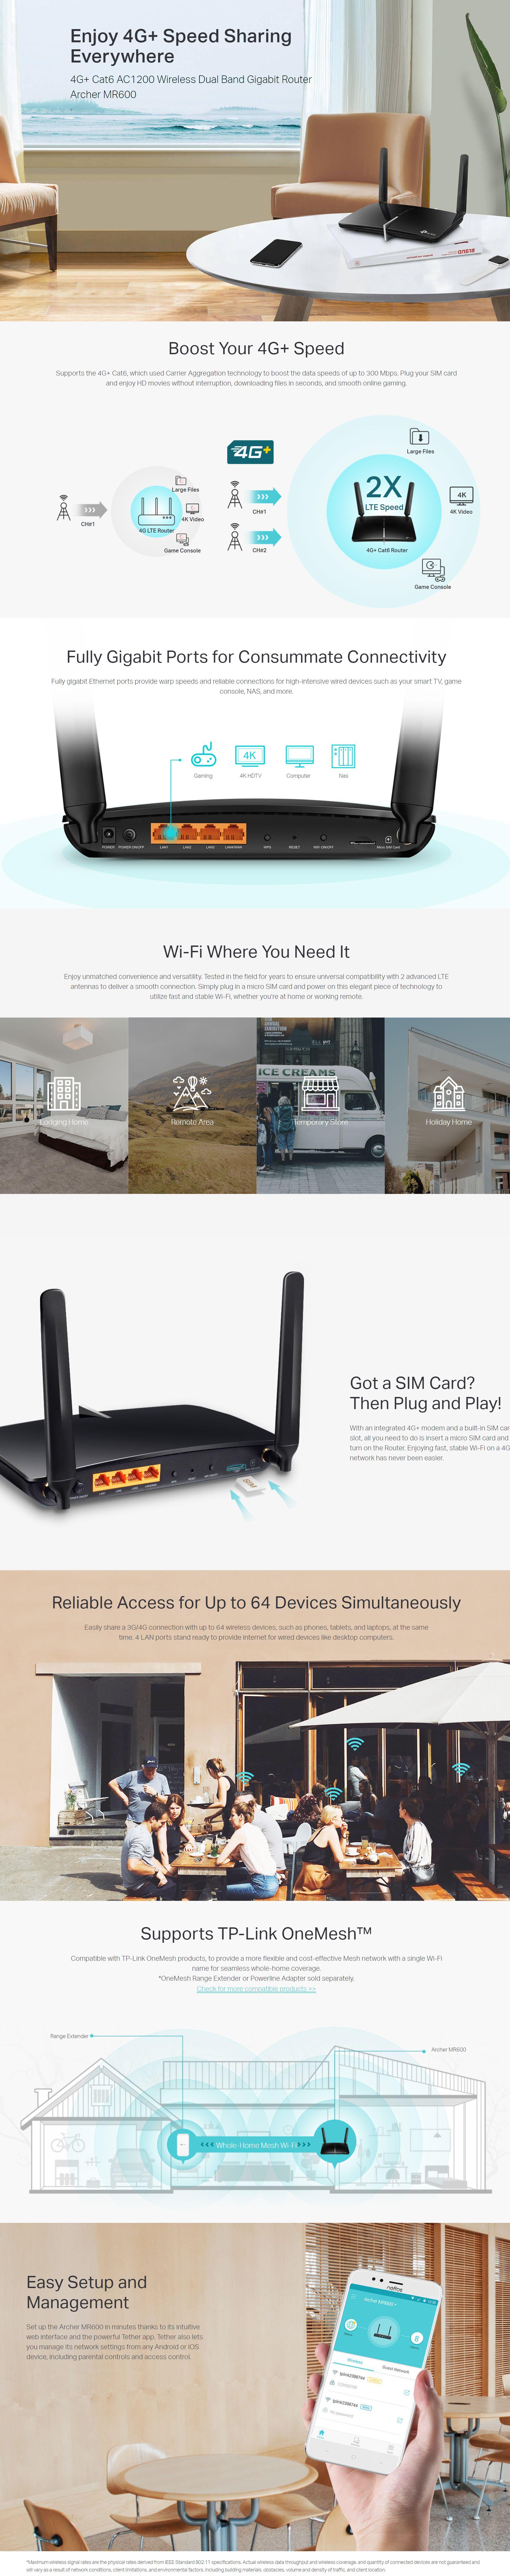 TP-Link Archer MR600 4G+ AC1200 Wireless Dual Band Gigabit Router